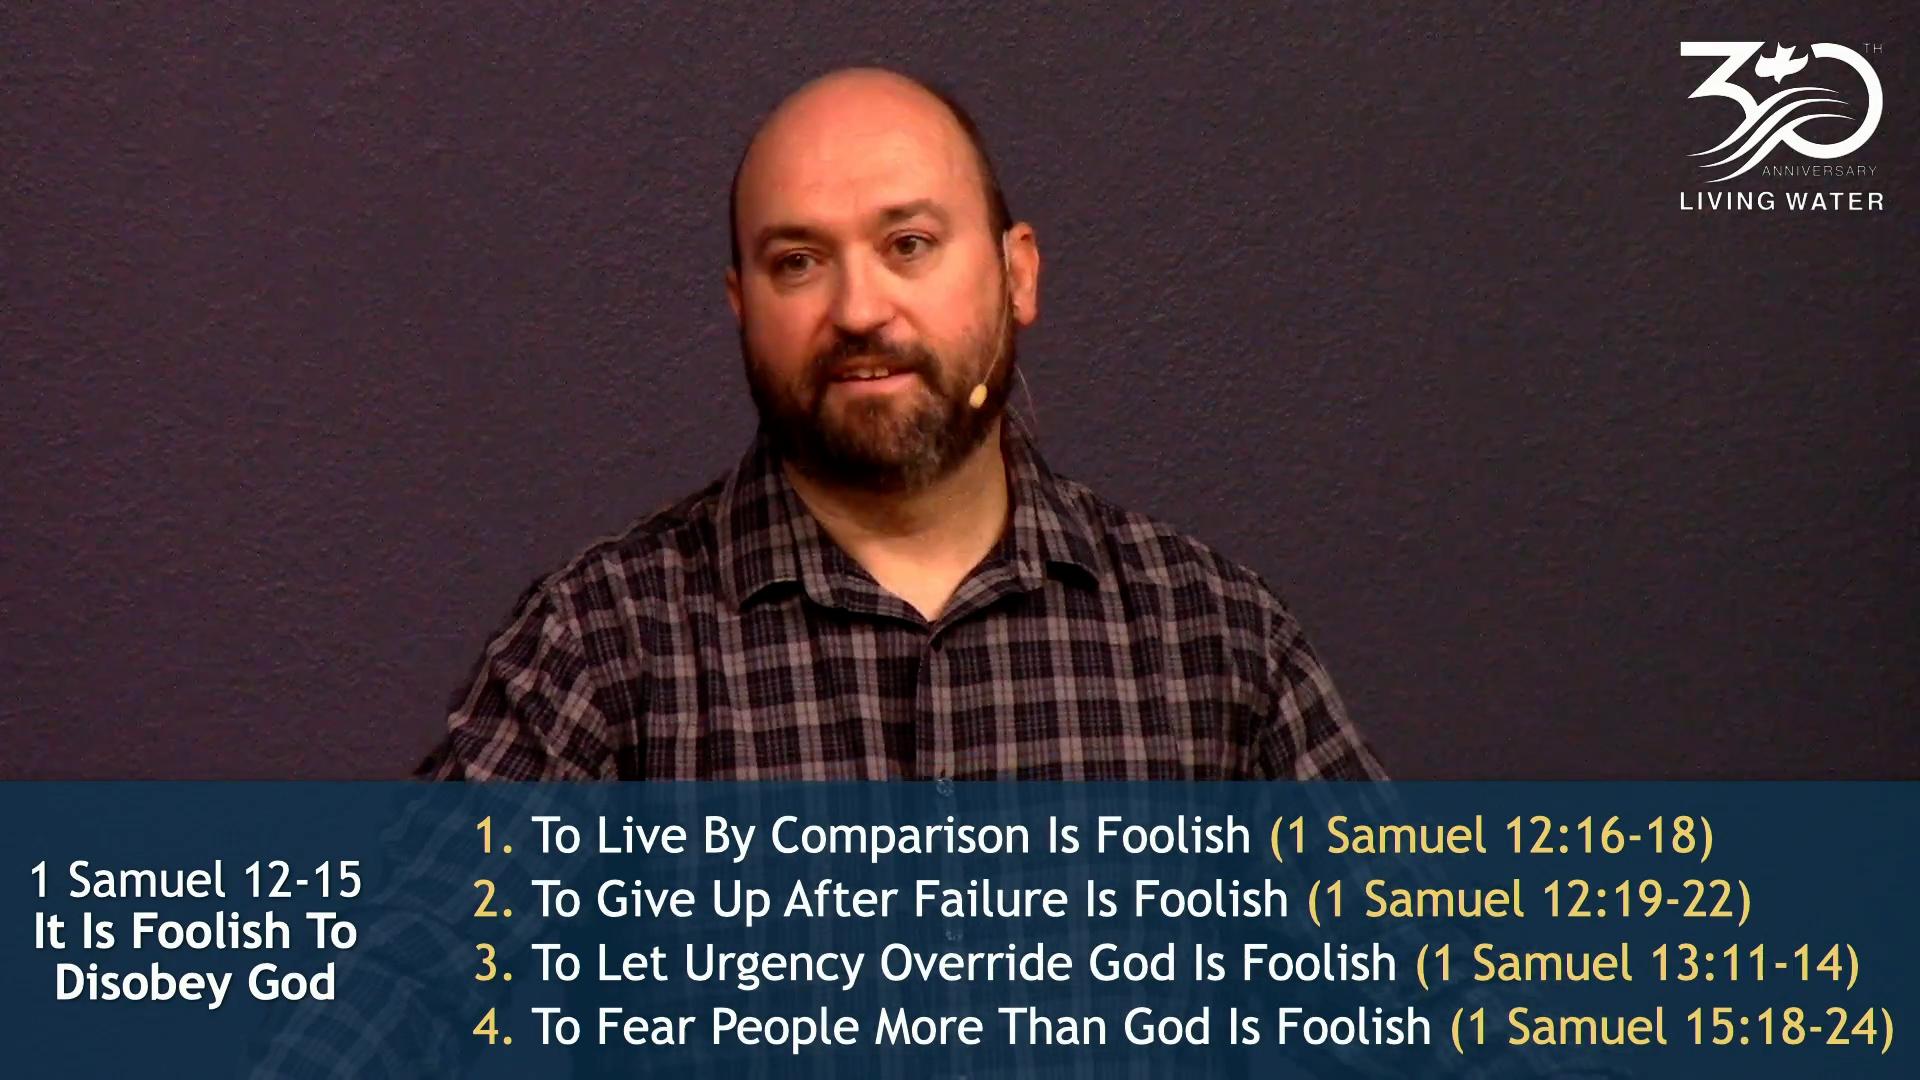 1 Samuel 12-15, It Is Foolish To Disobey God